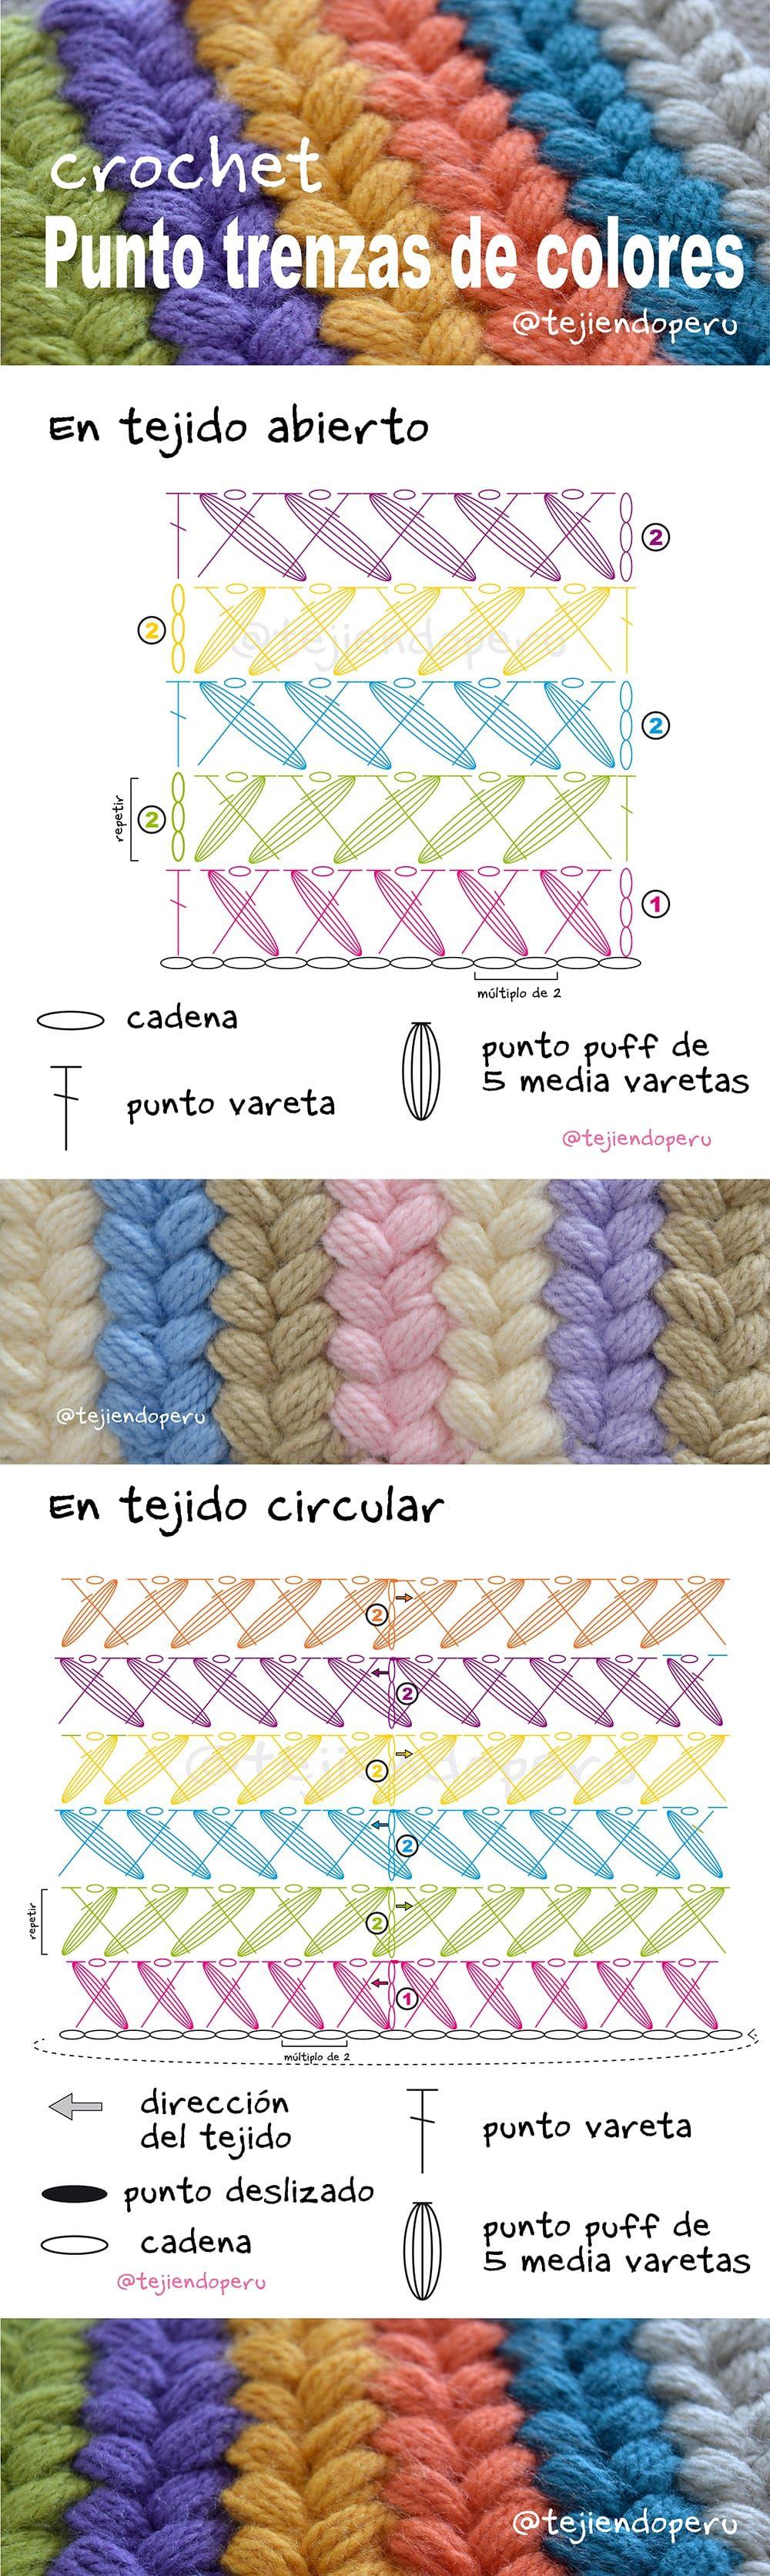 Punto trenzas de colores a crochet paso a paso | crochet aleja ...